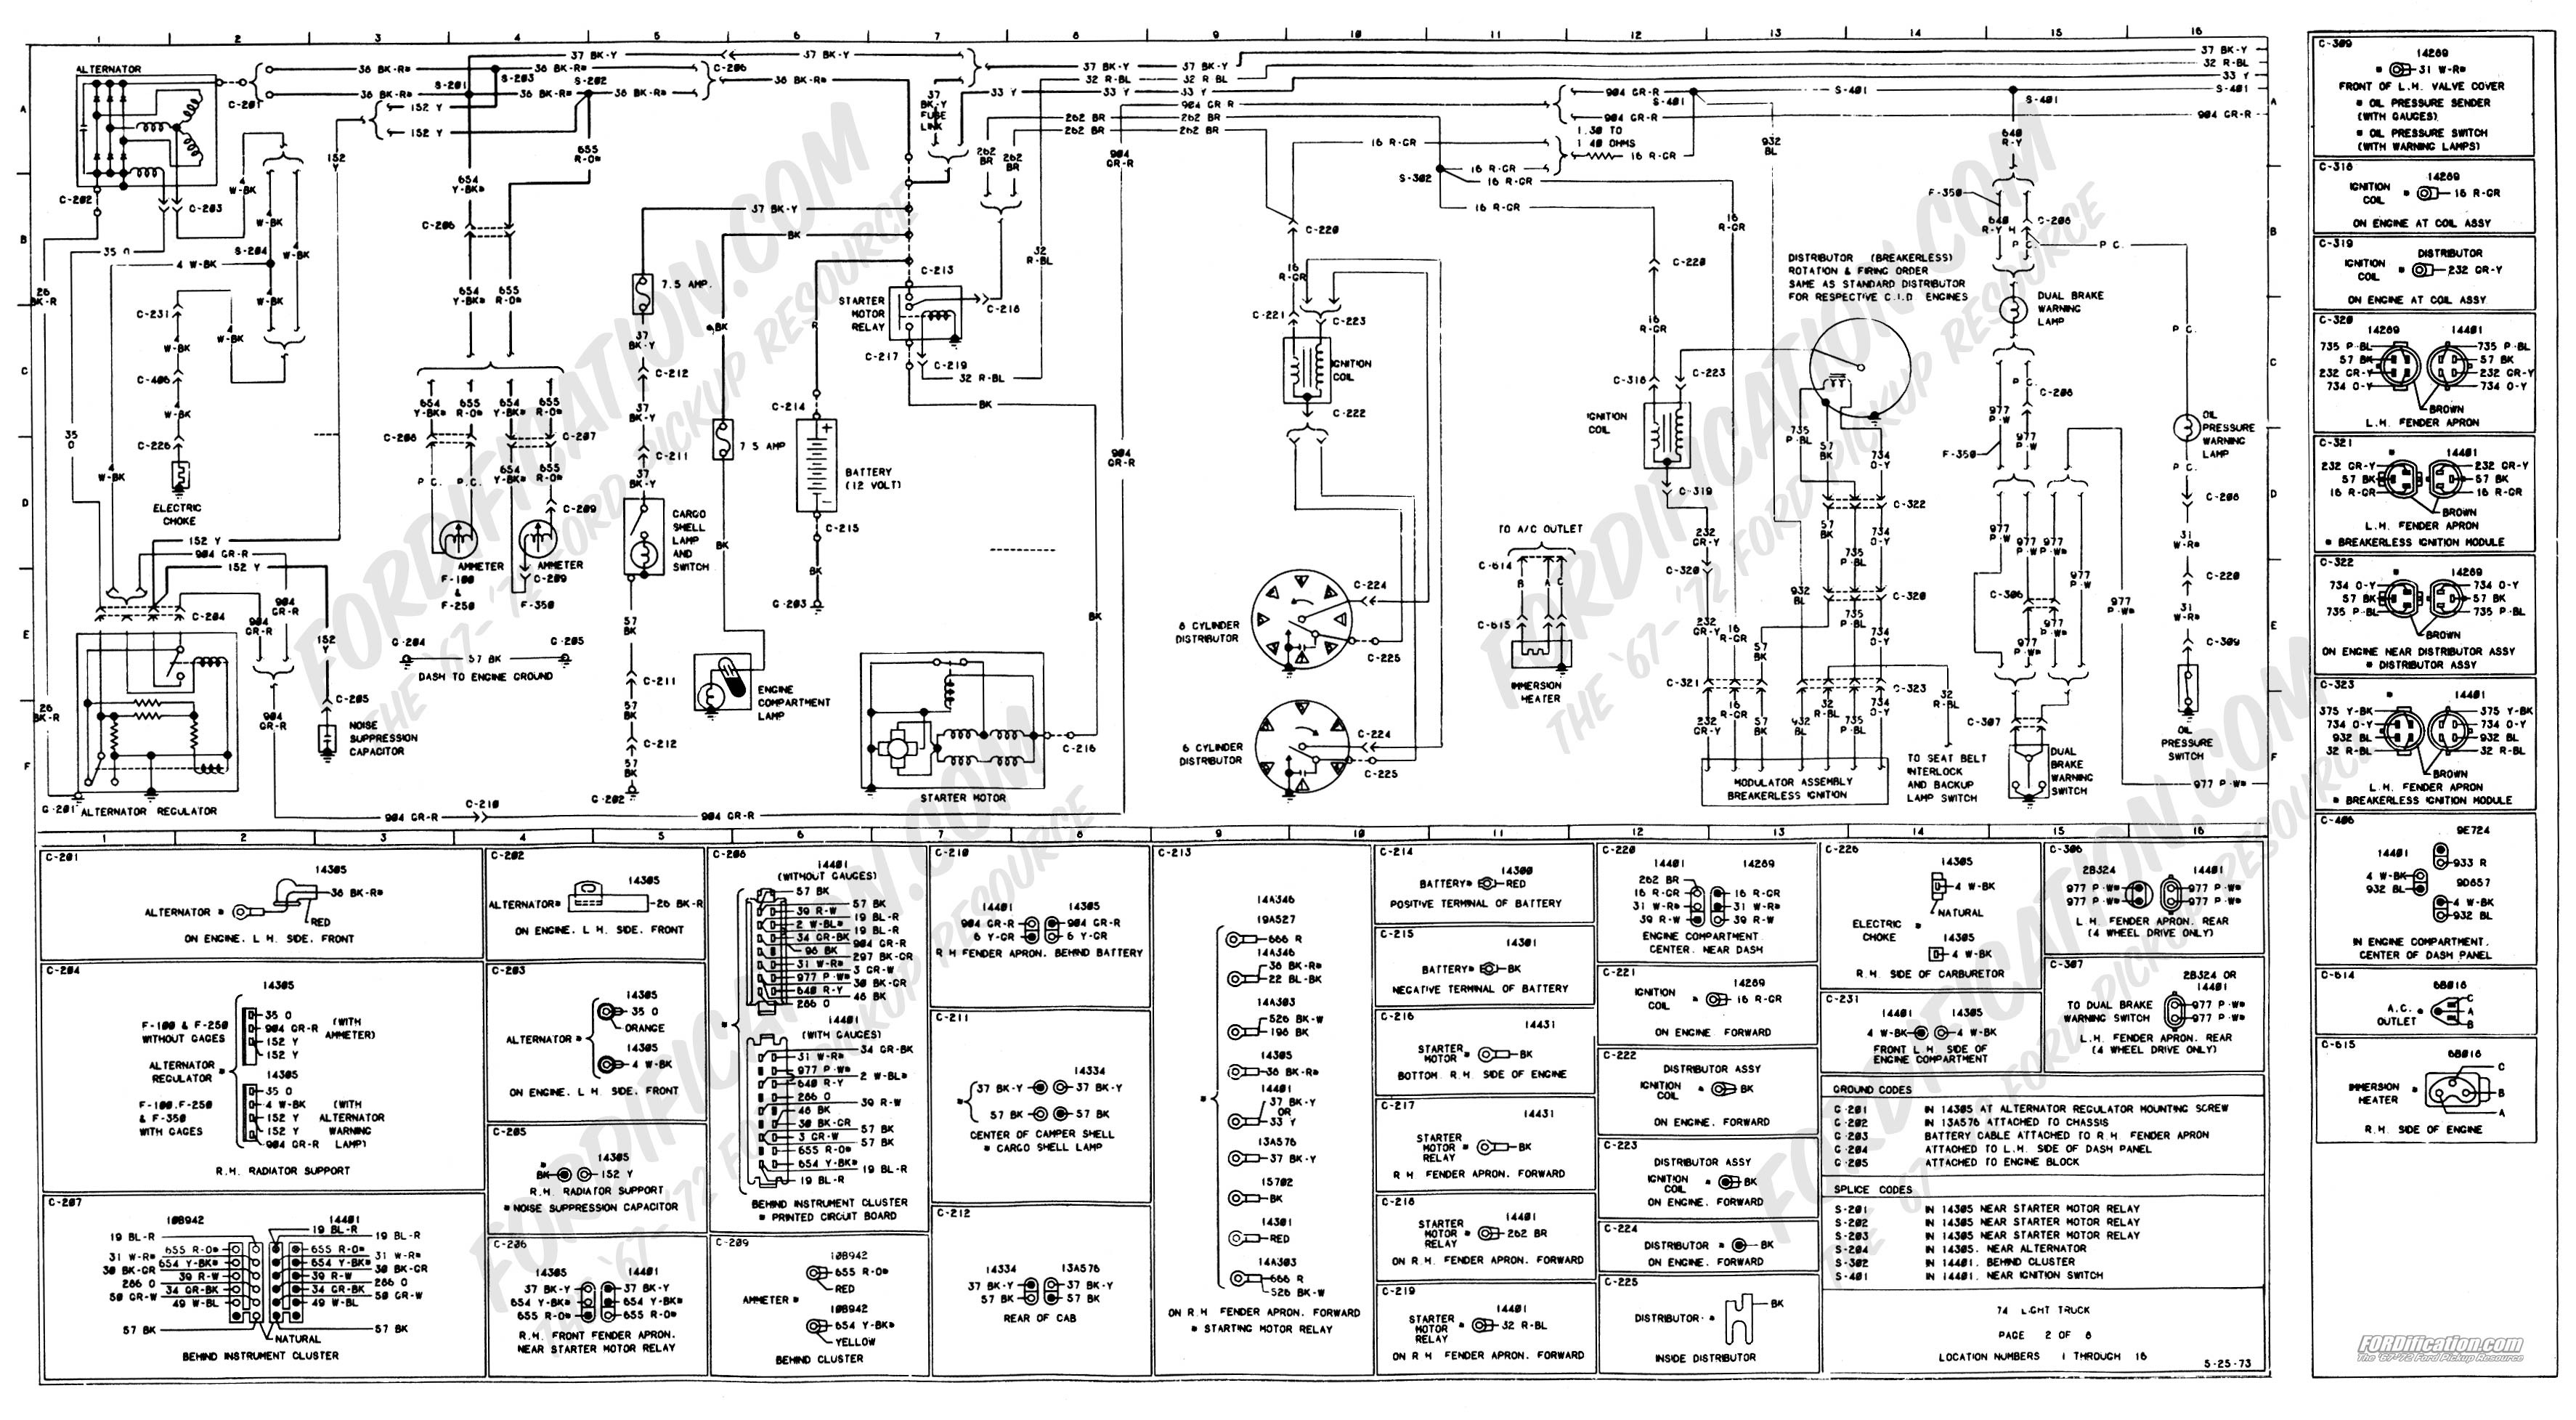 1973 f700 wiring diagram wiring diagram